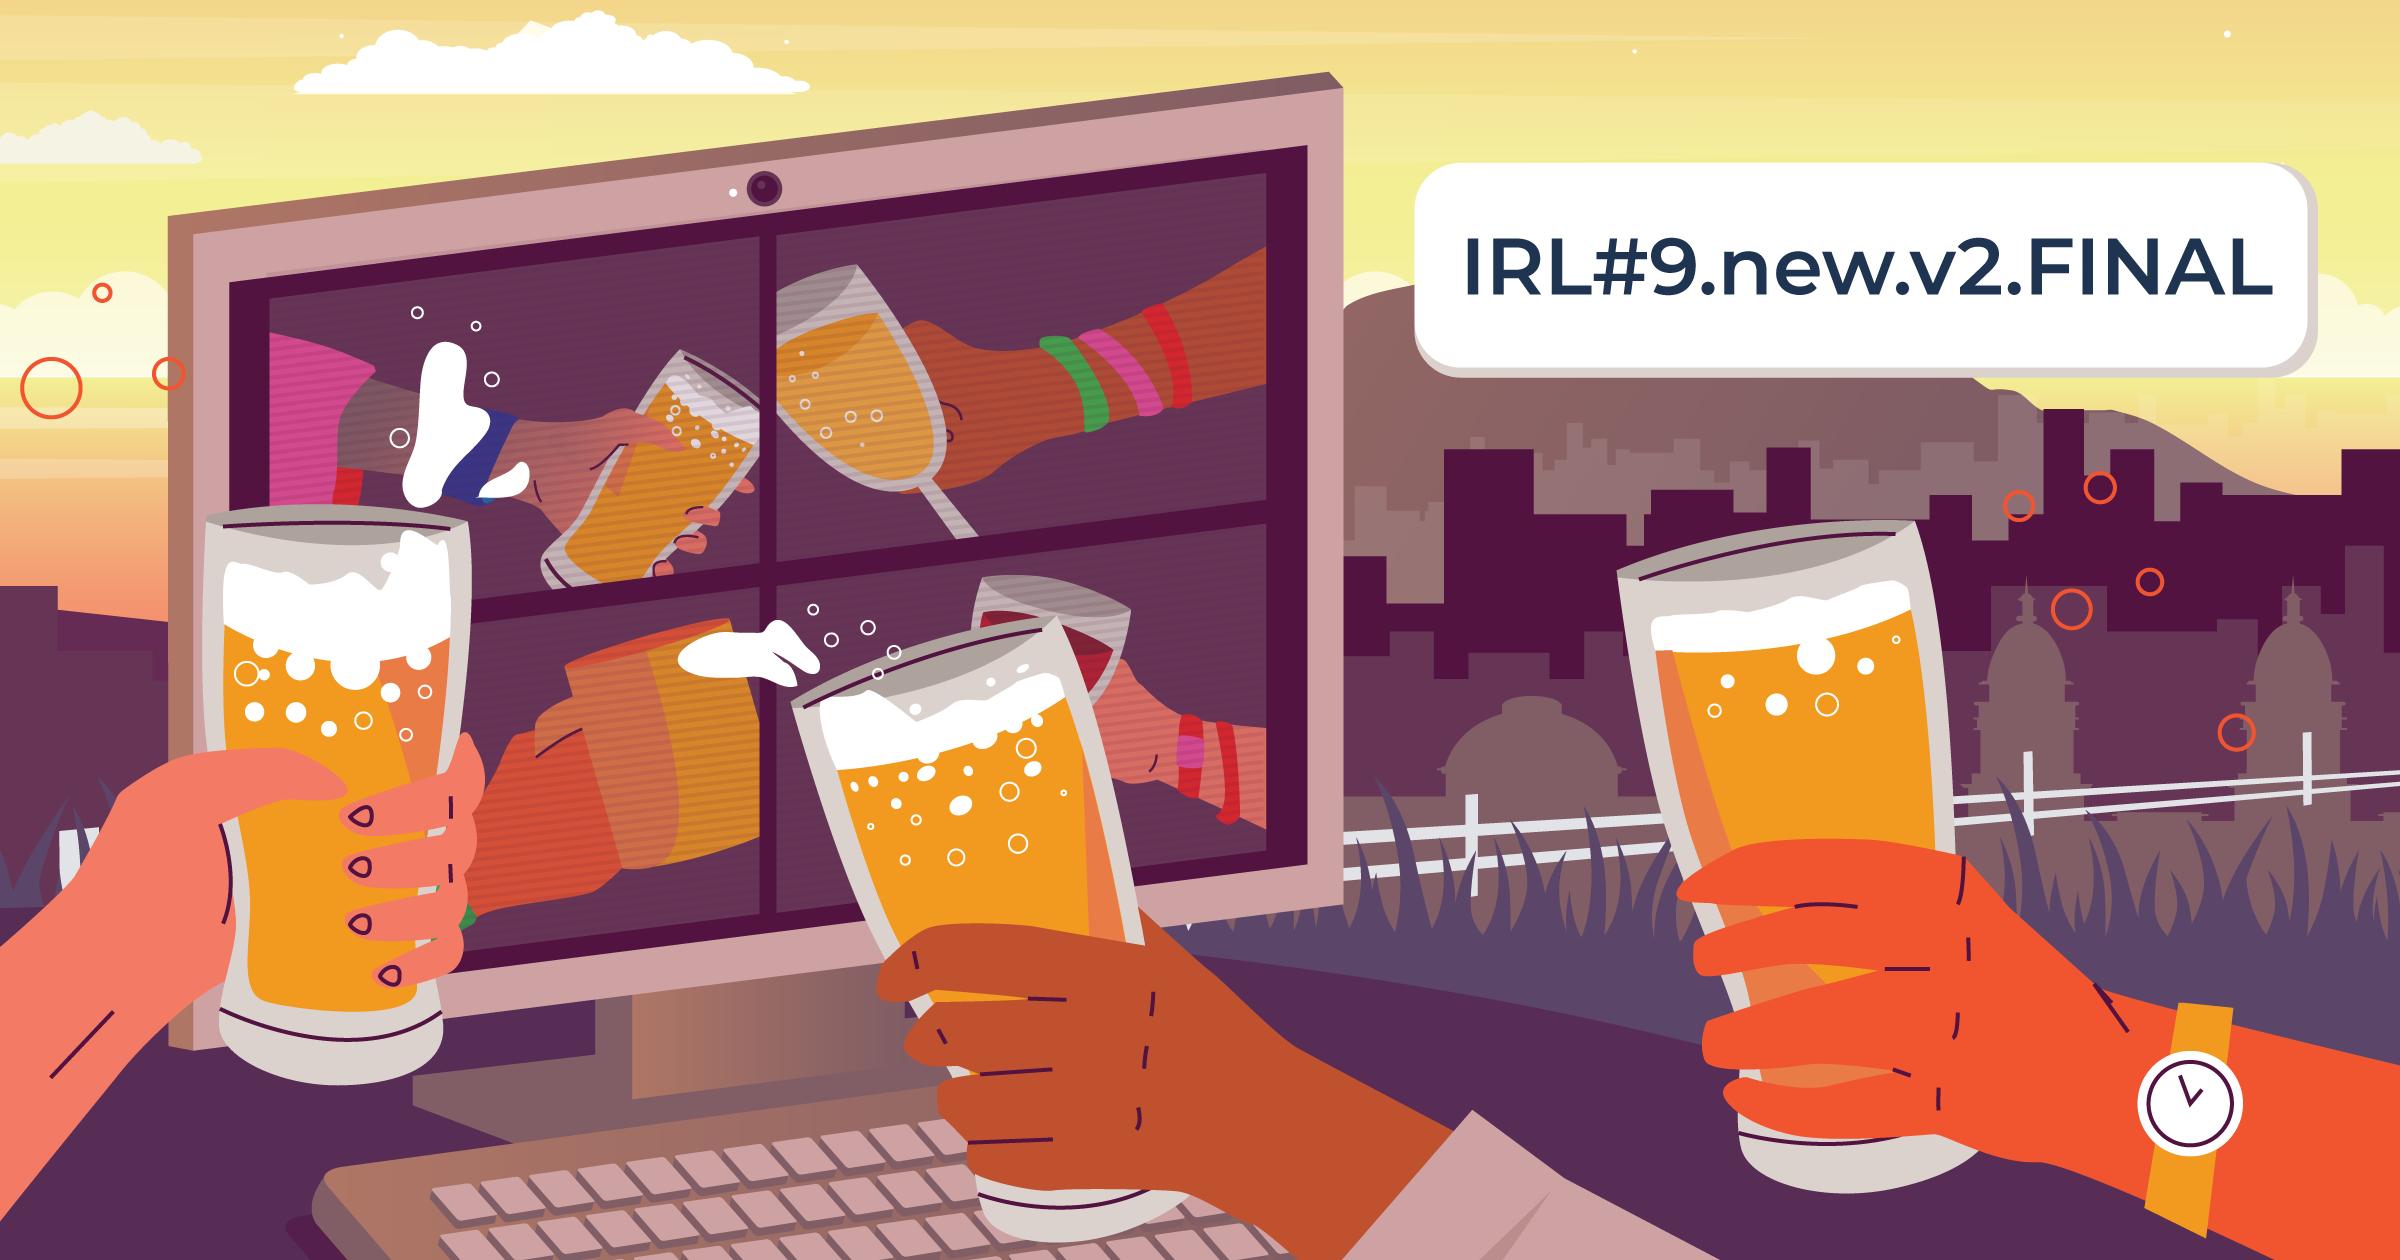 Niteo IRL#9 featured image